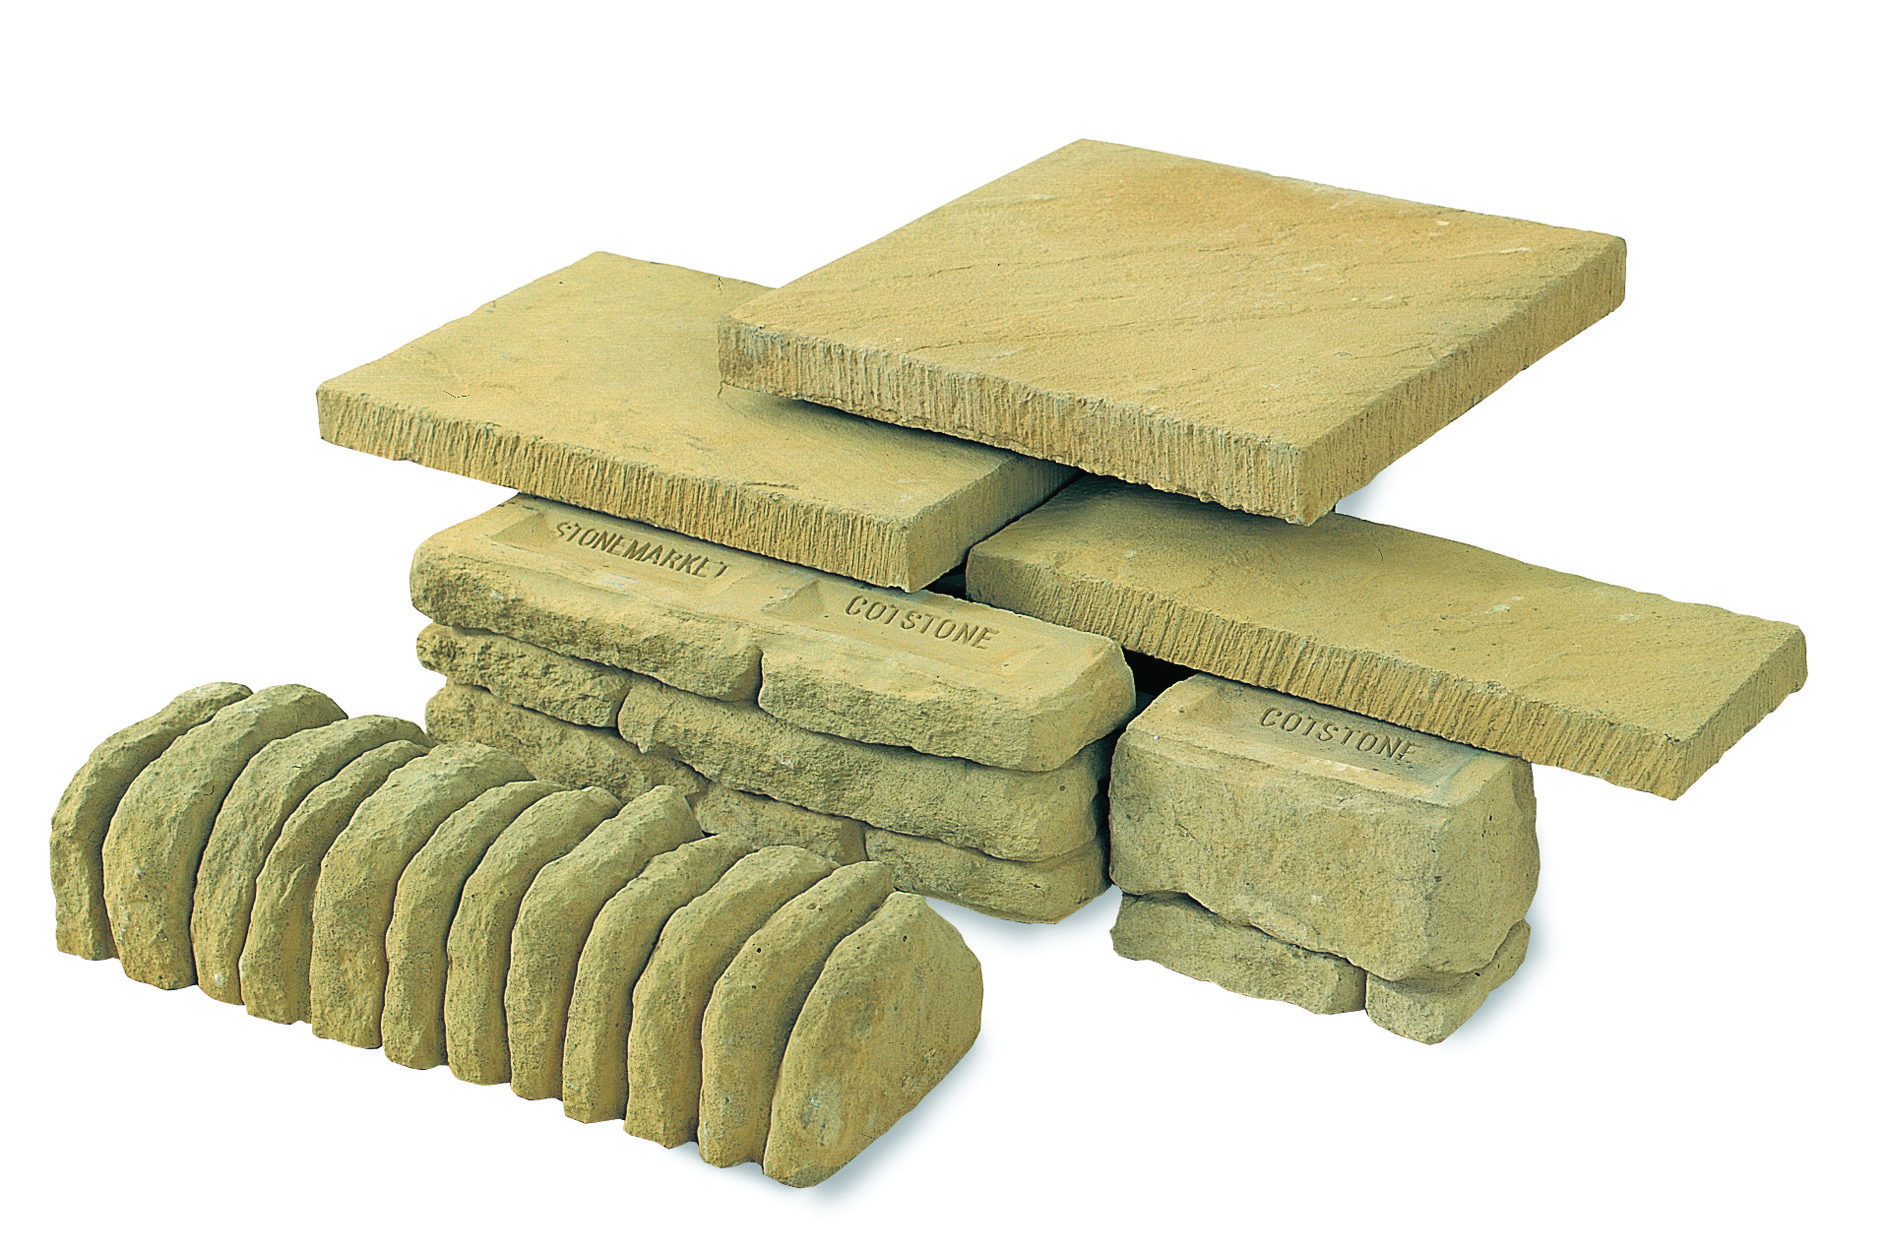 Cotstone Walling